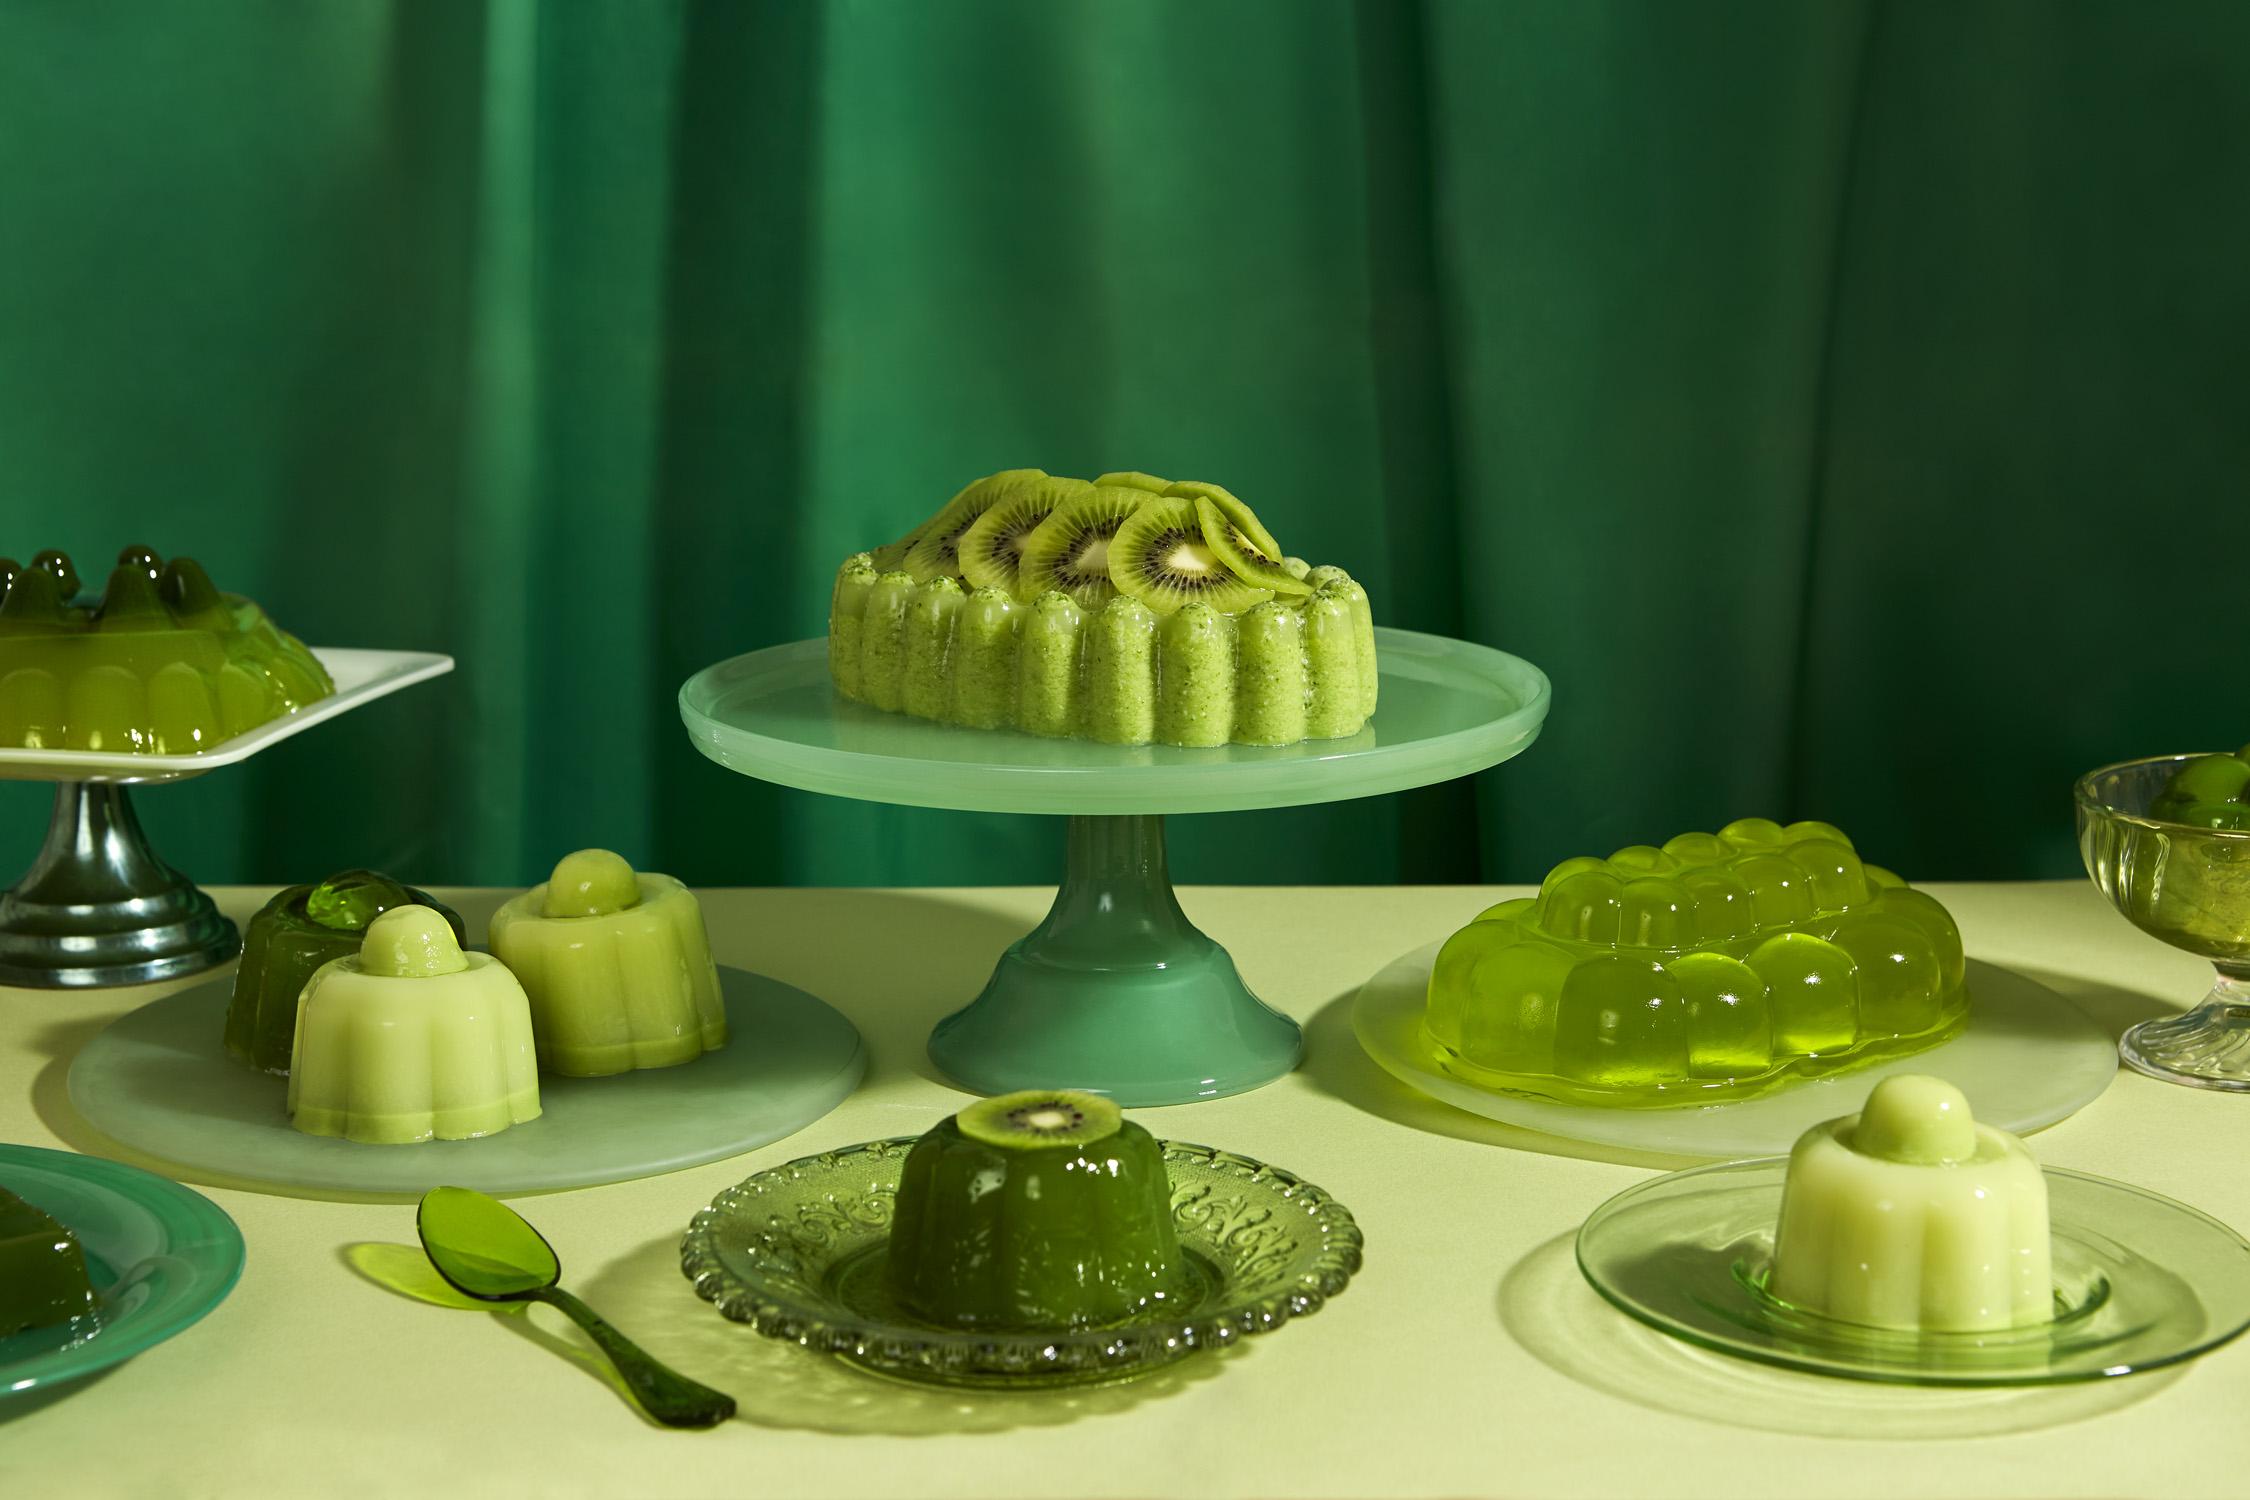 Green Jelly 1.jpg